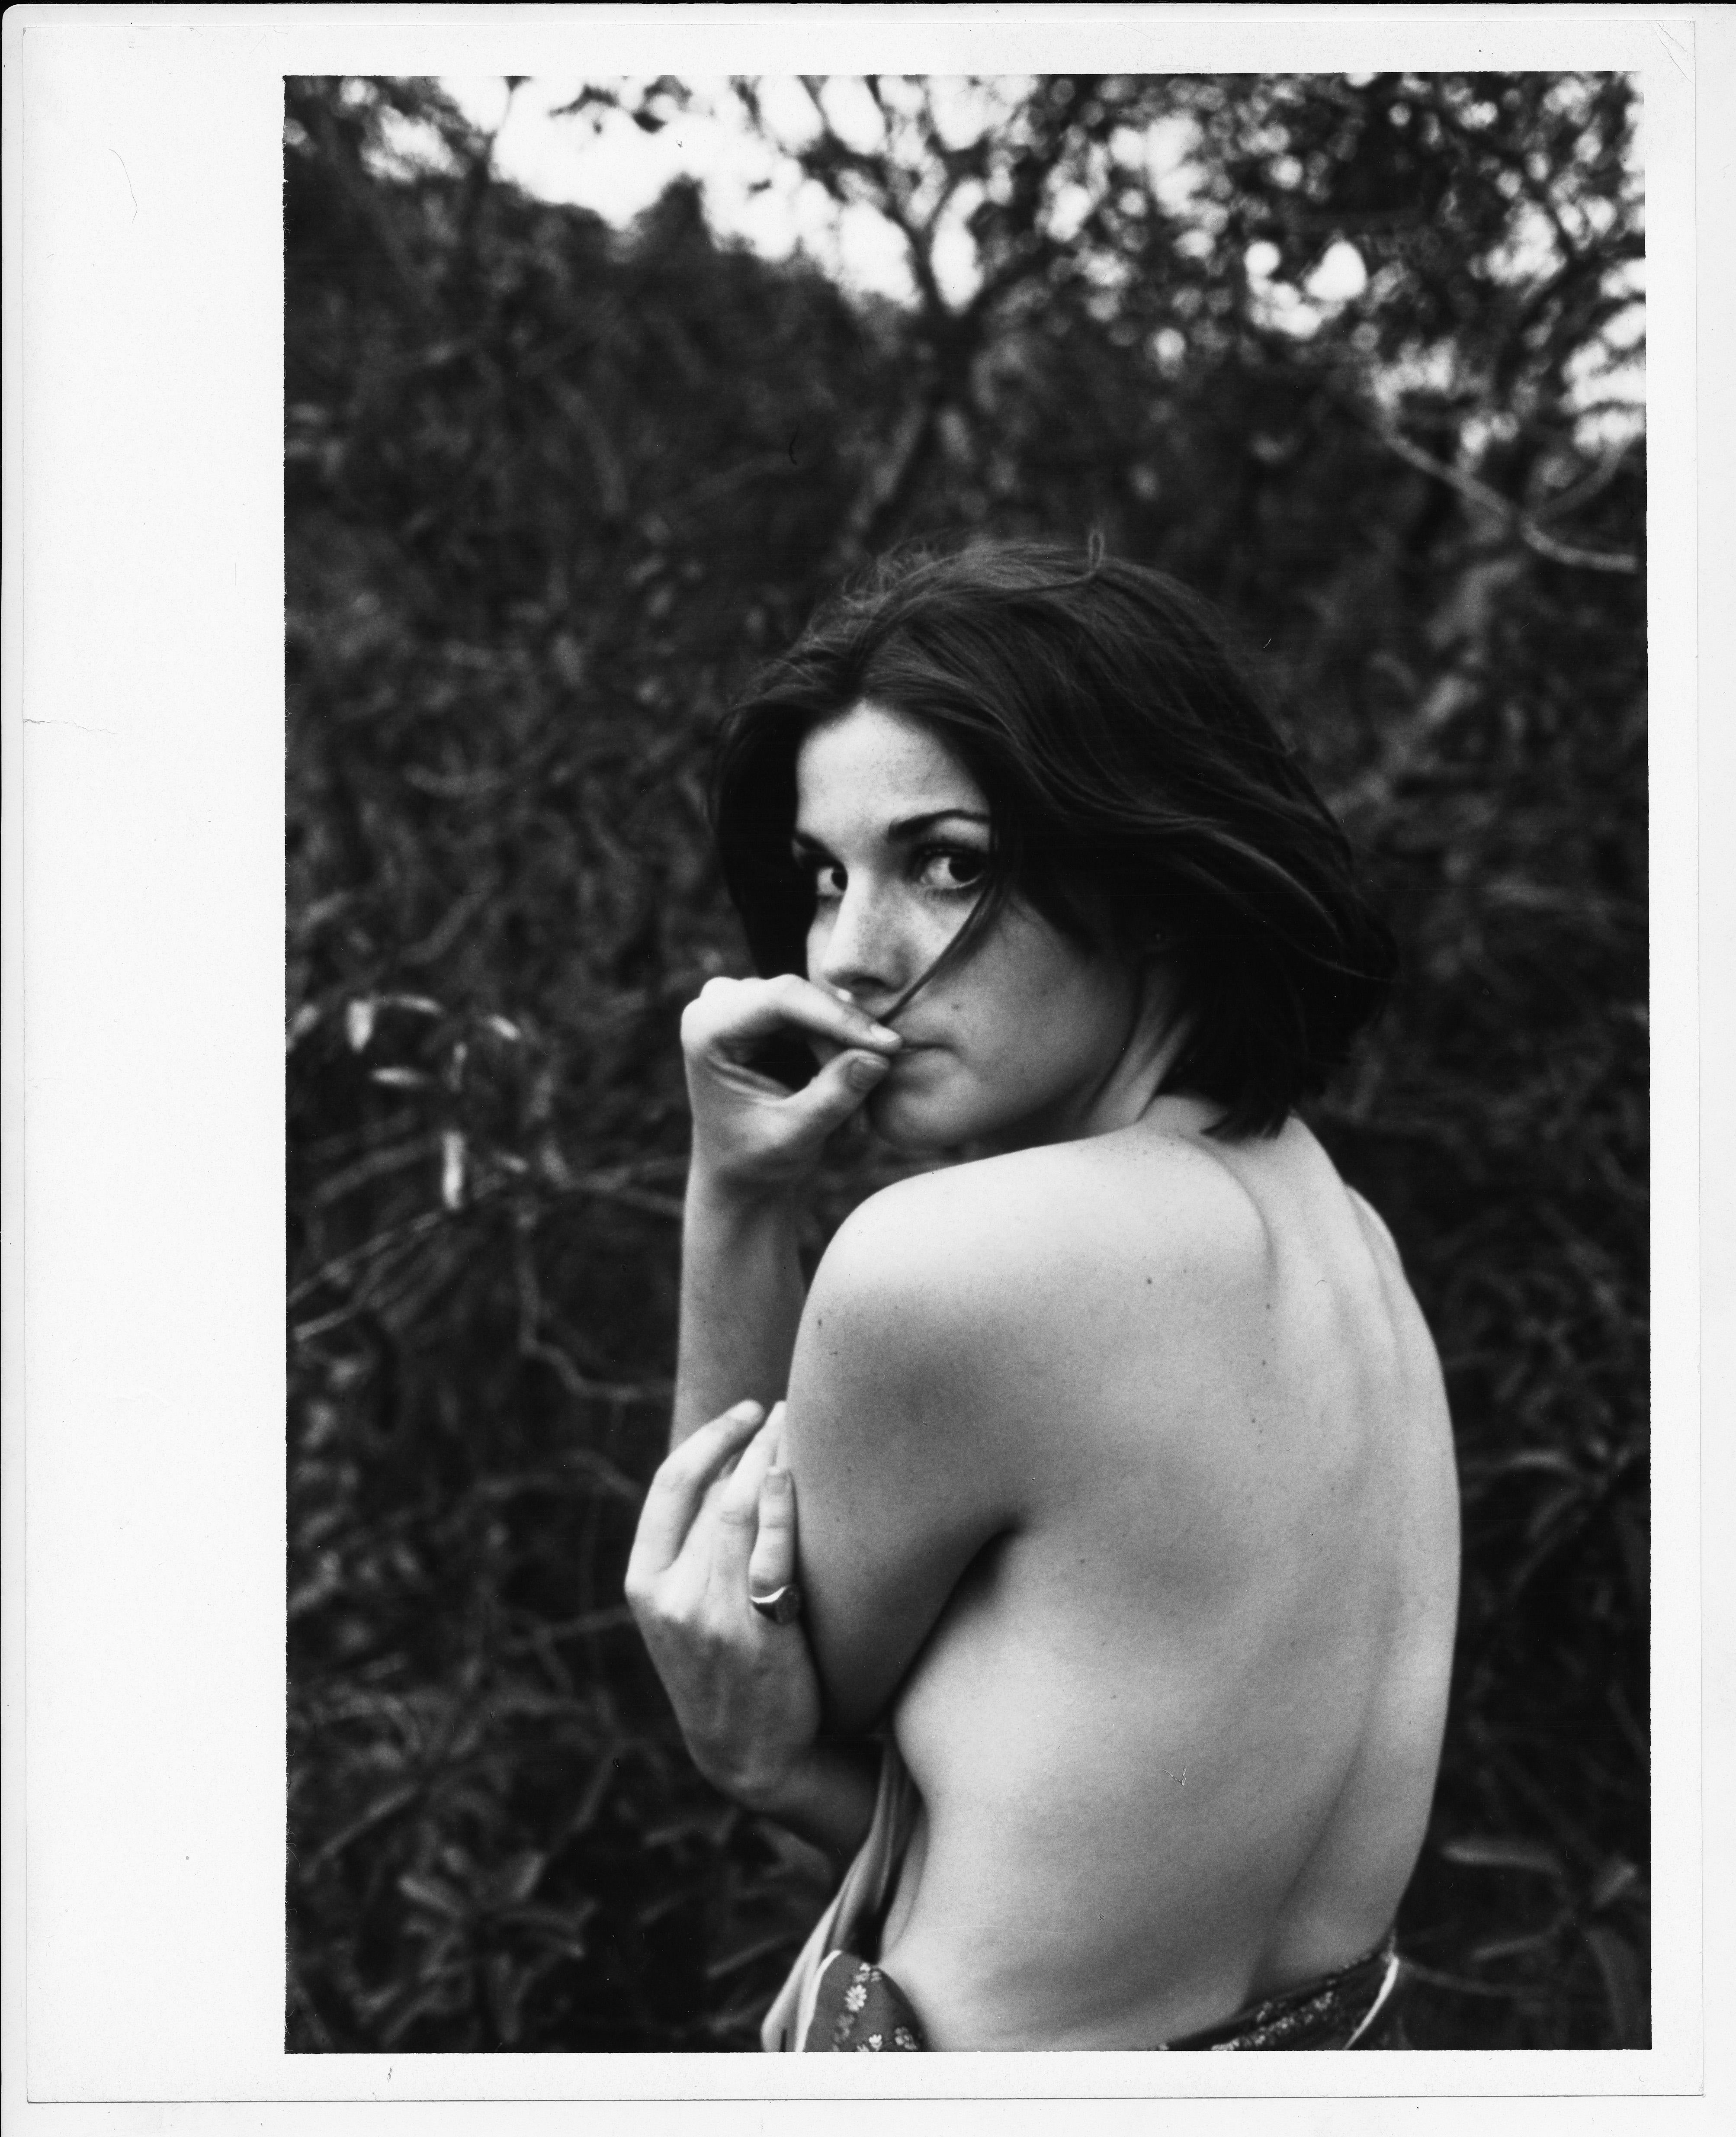 Nude - A photo story of Susan Saint James by Henry Grossmann, circa 1970s.